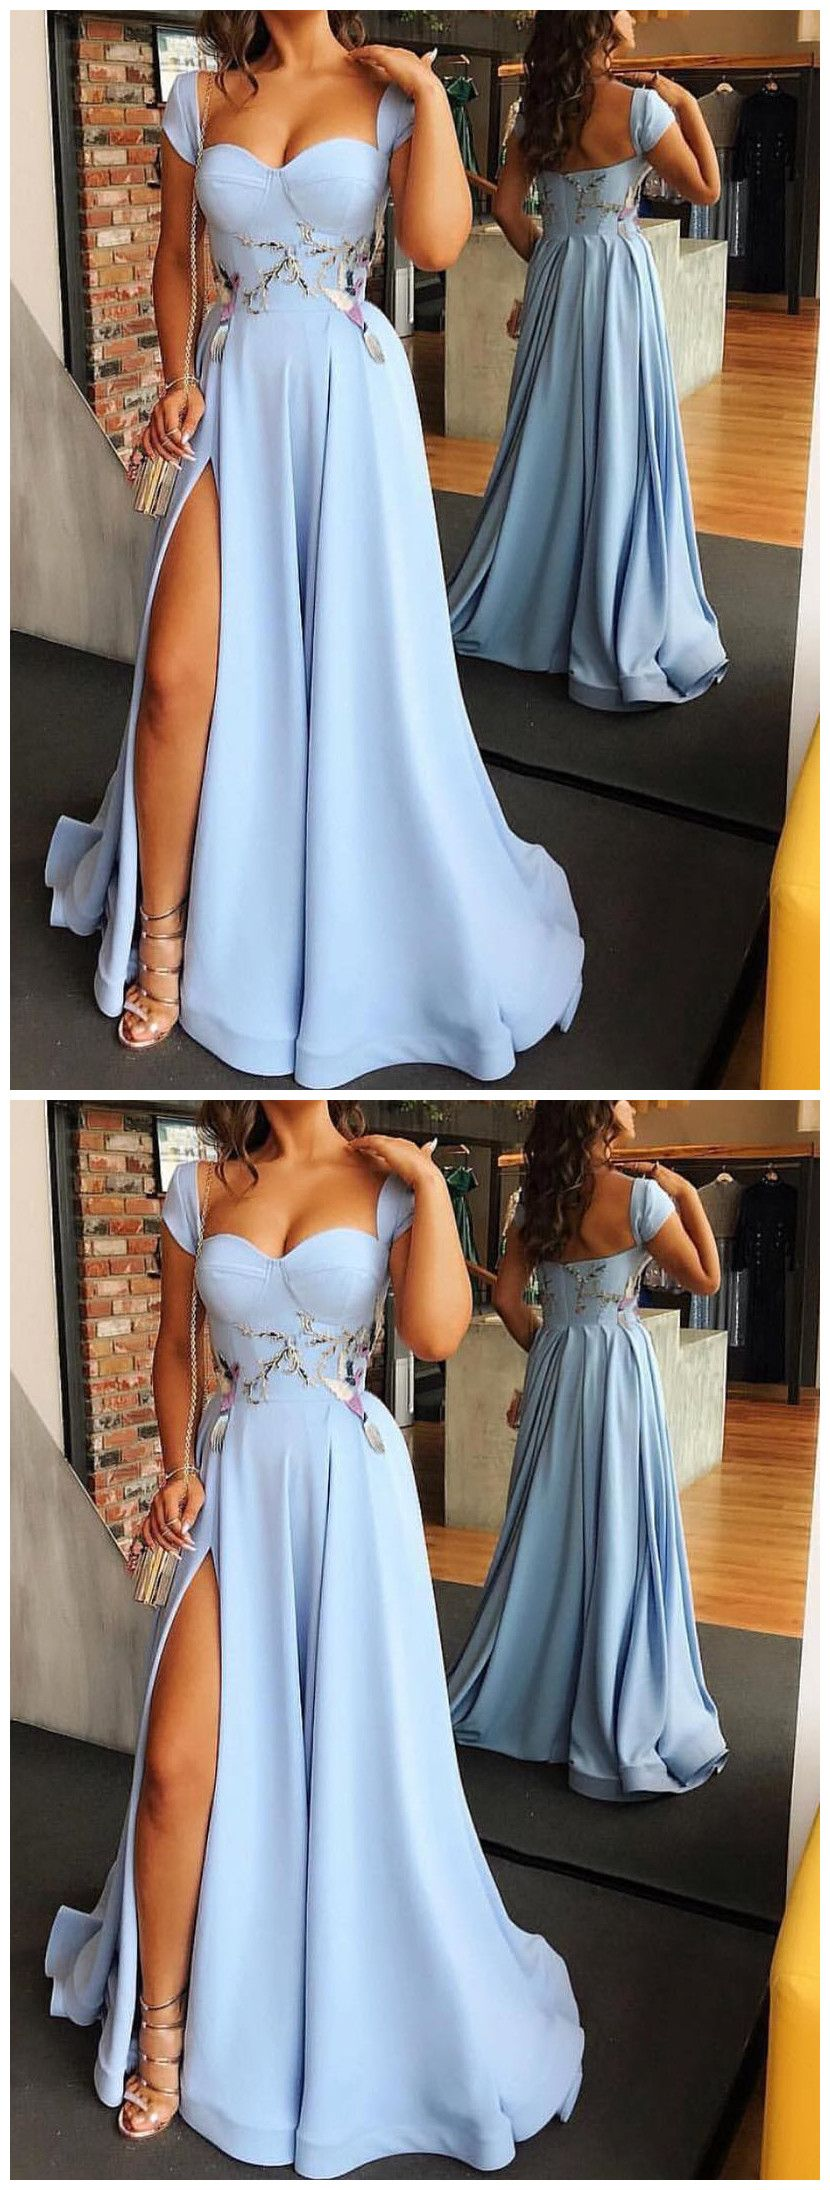 aline straps prom dresses with silt blue long prom dresses